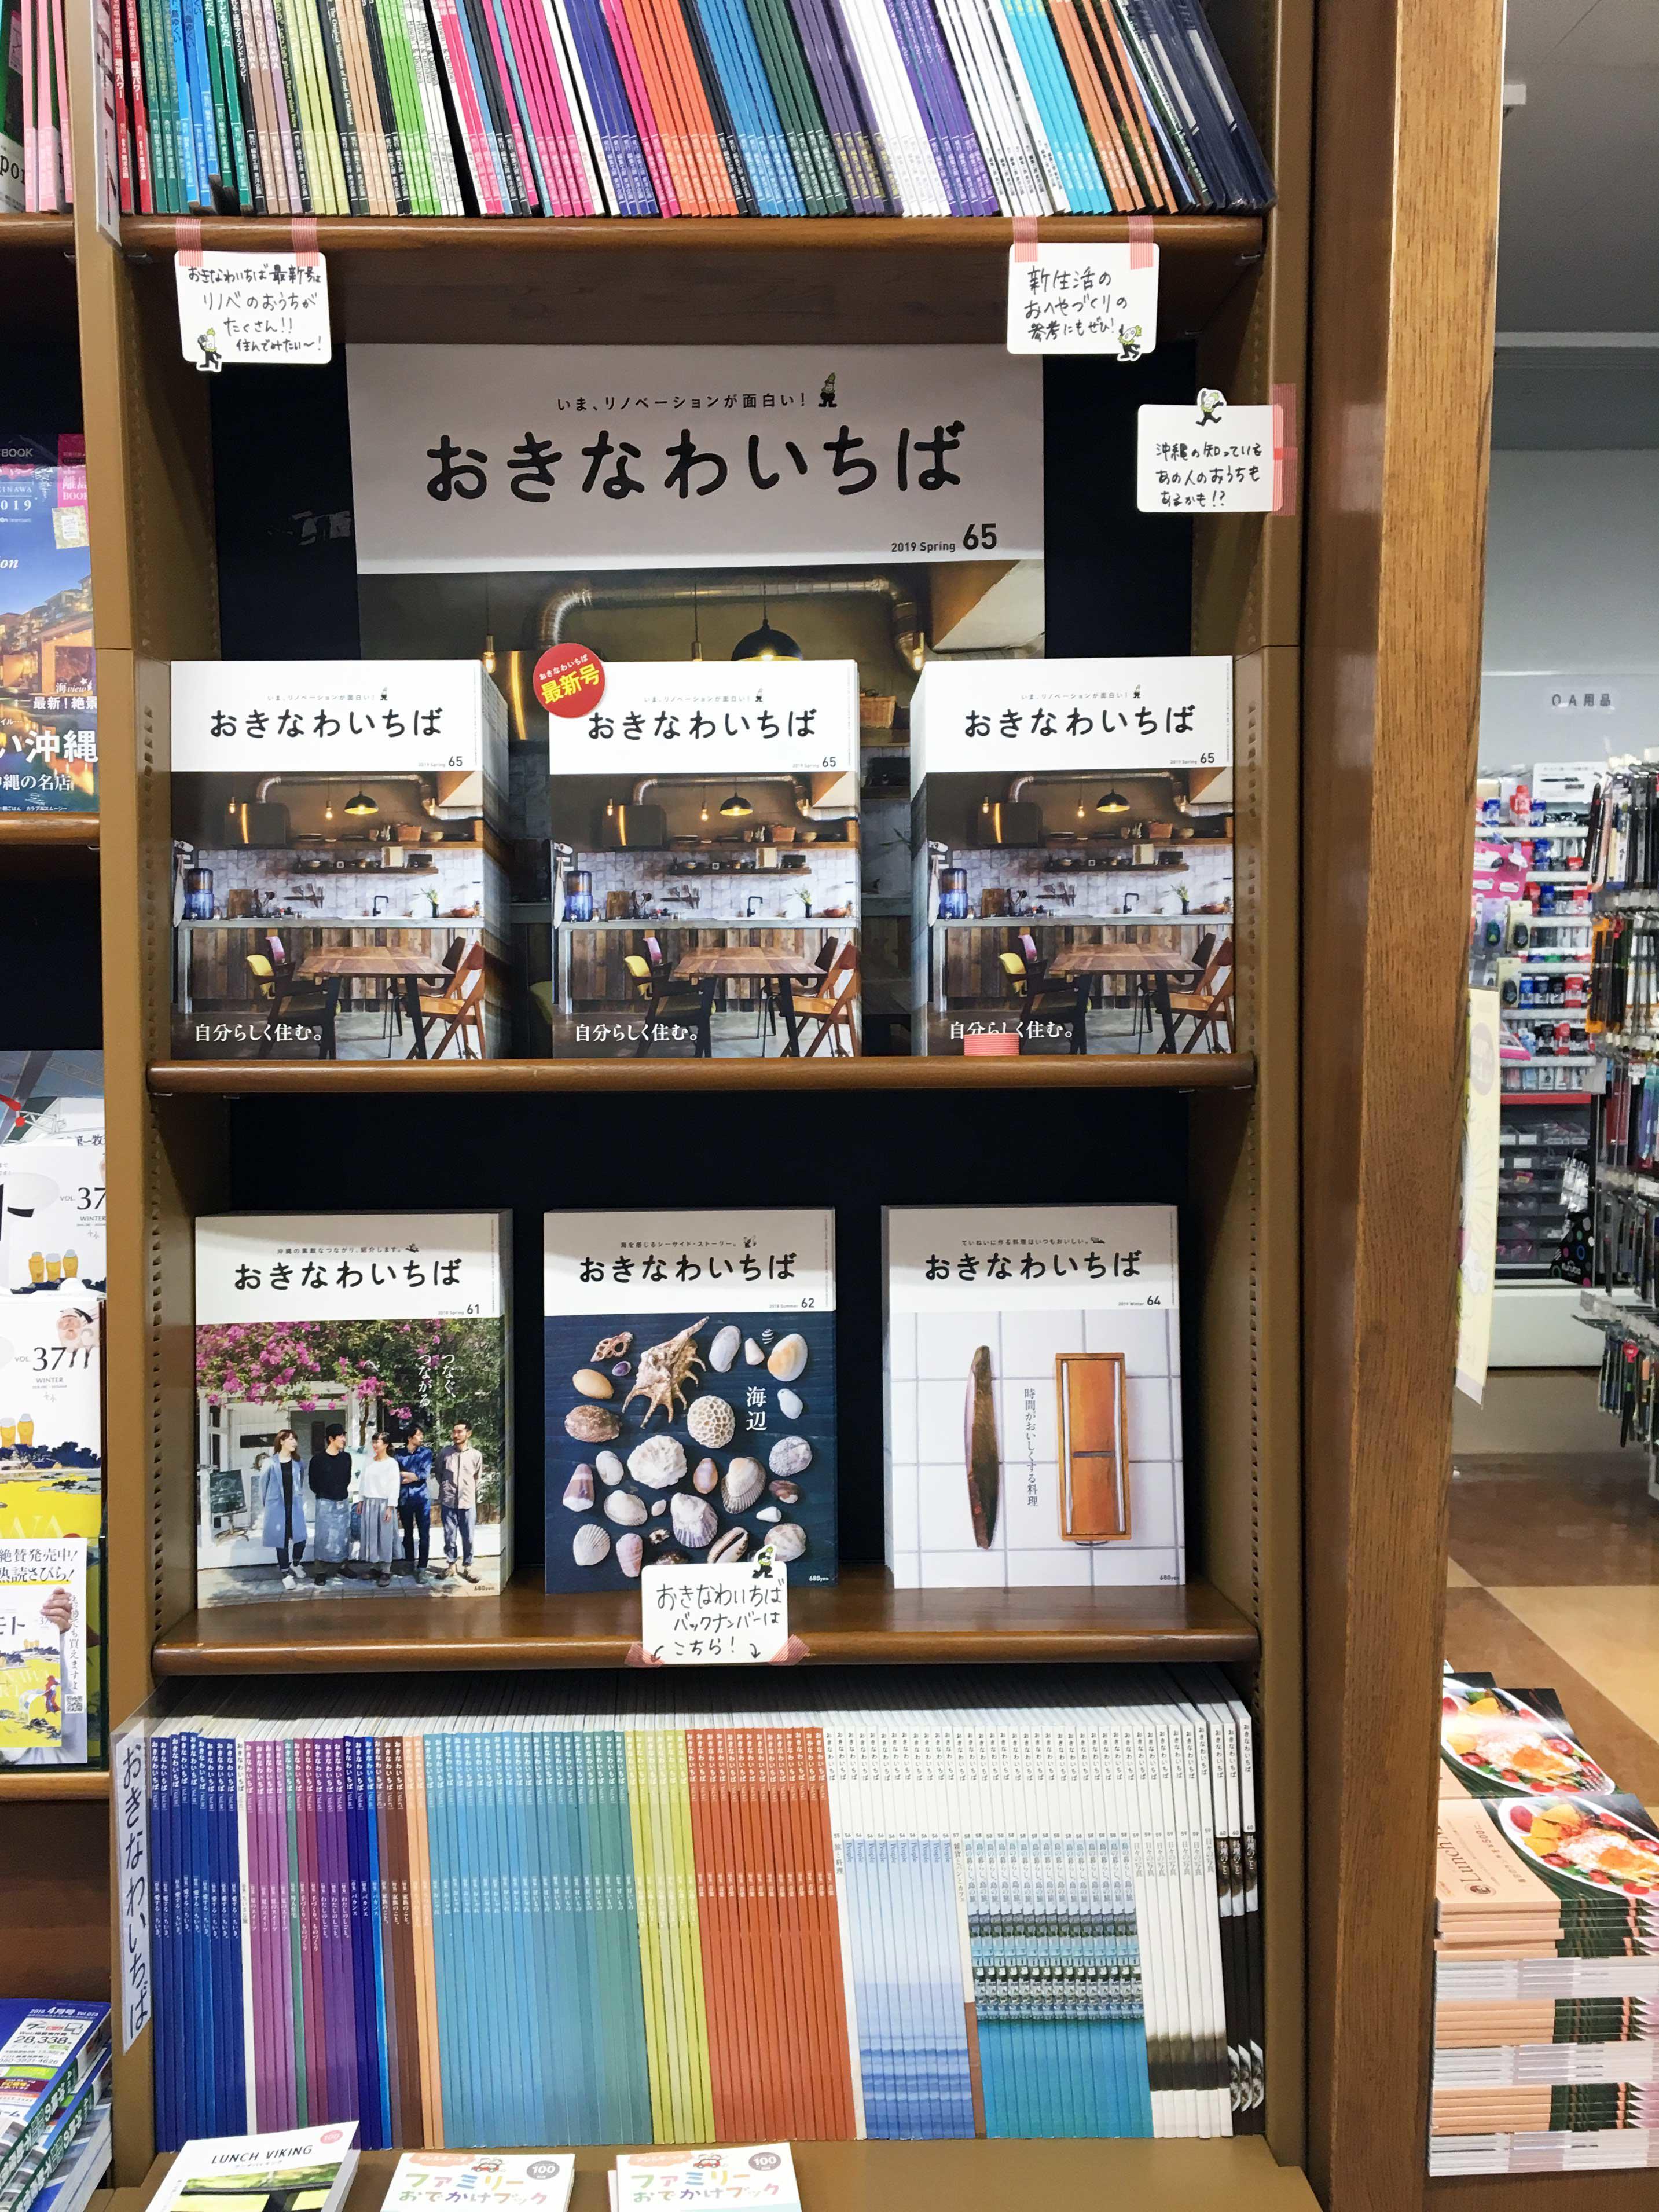 https://www.okinawa-ichiba.jp/article/2019/03/06/junkdonaha0305.jpg